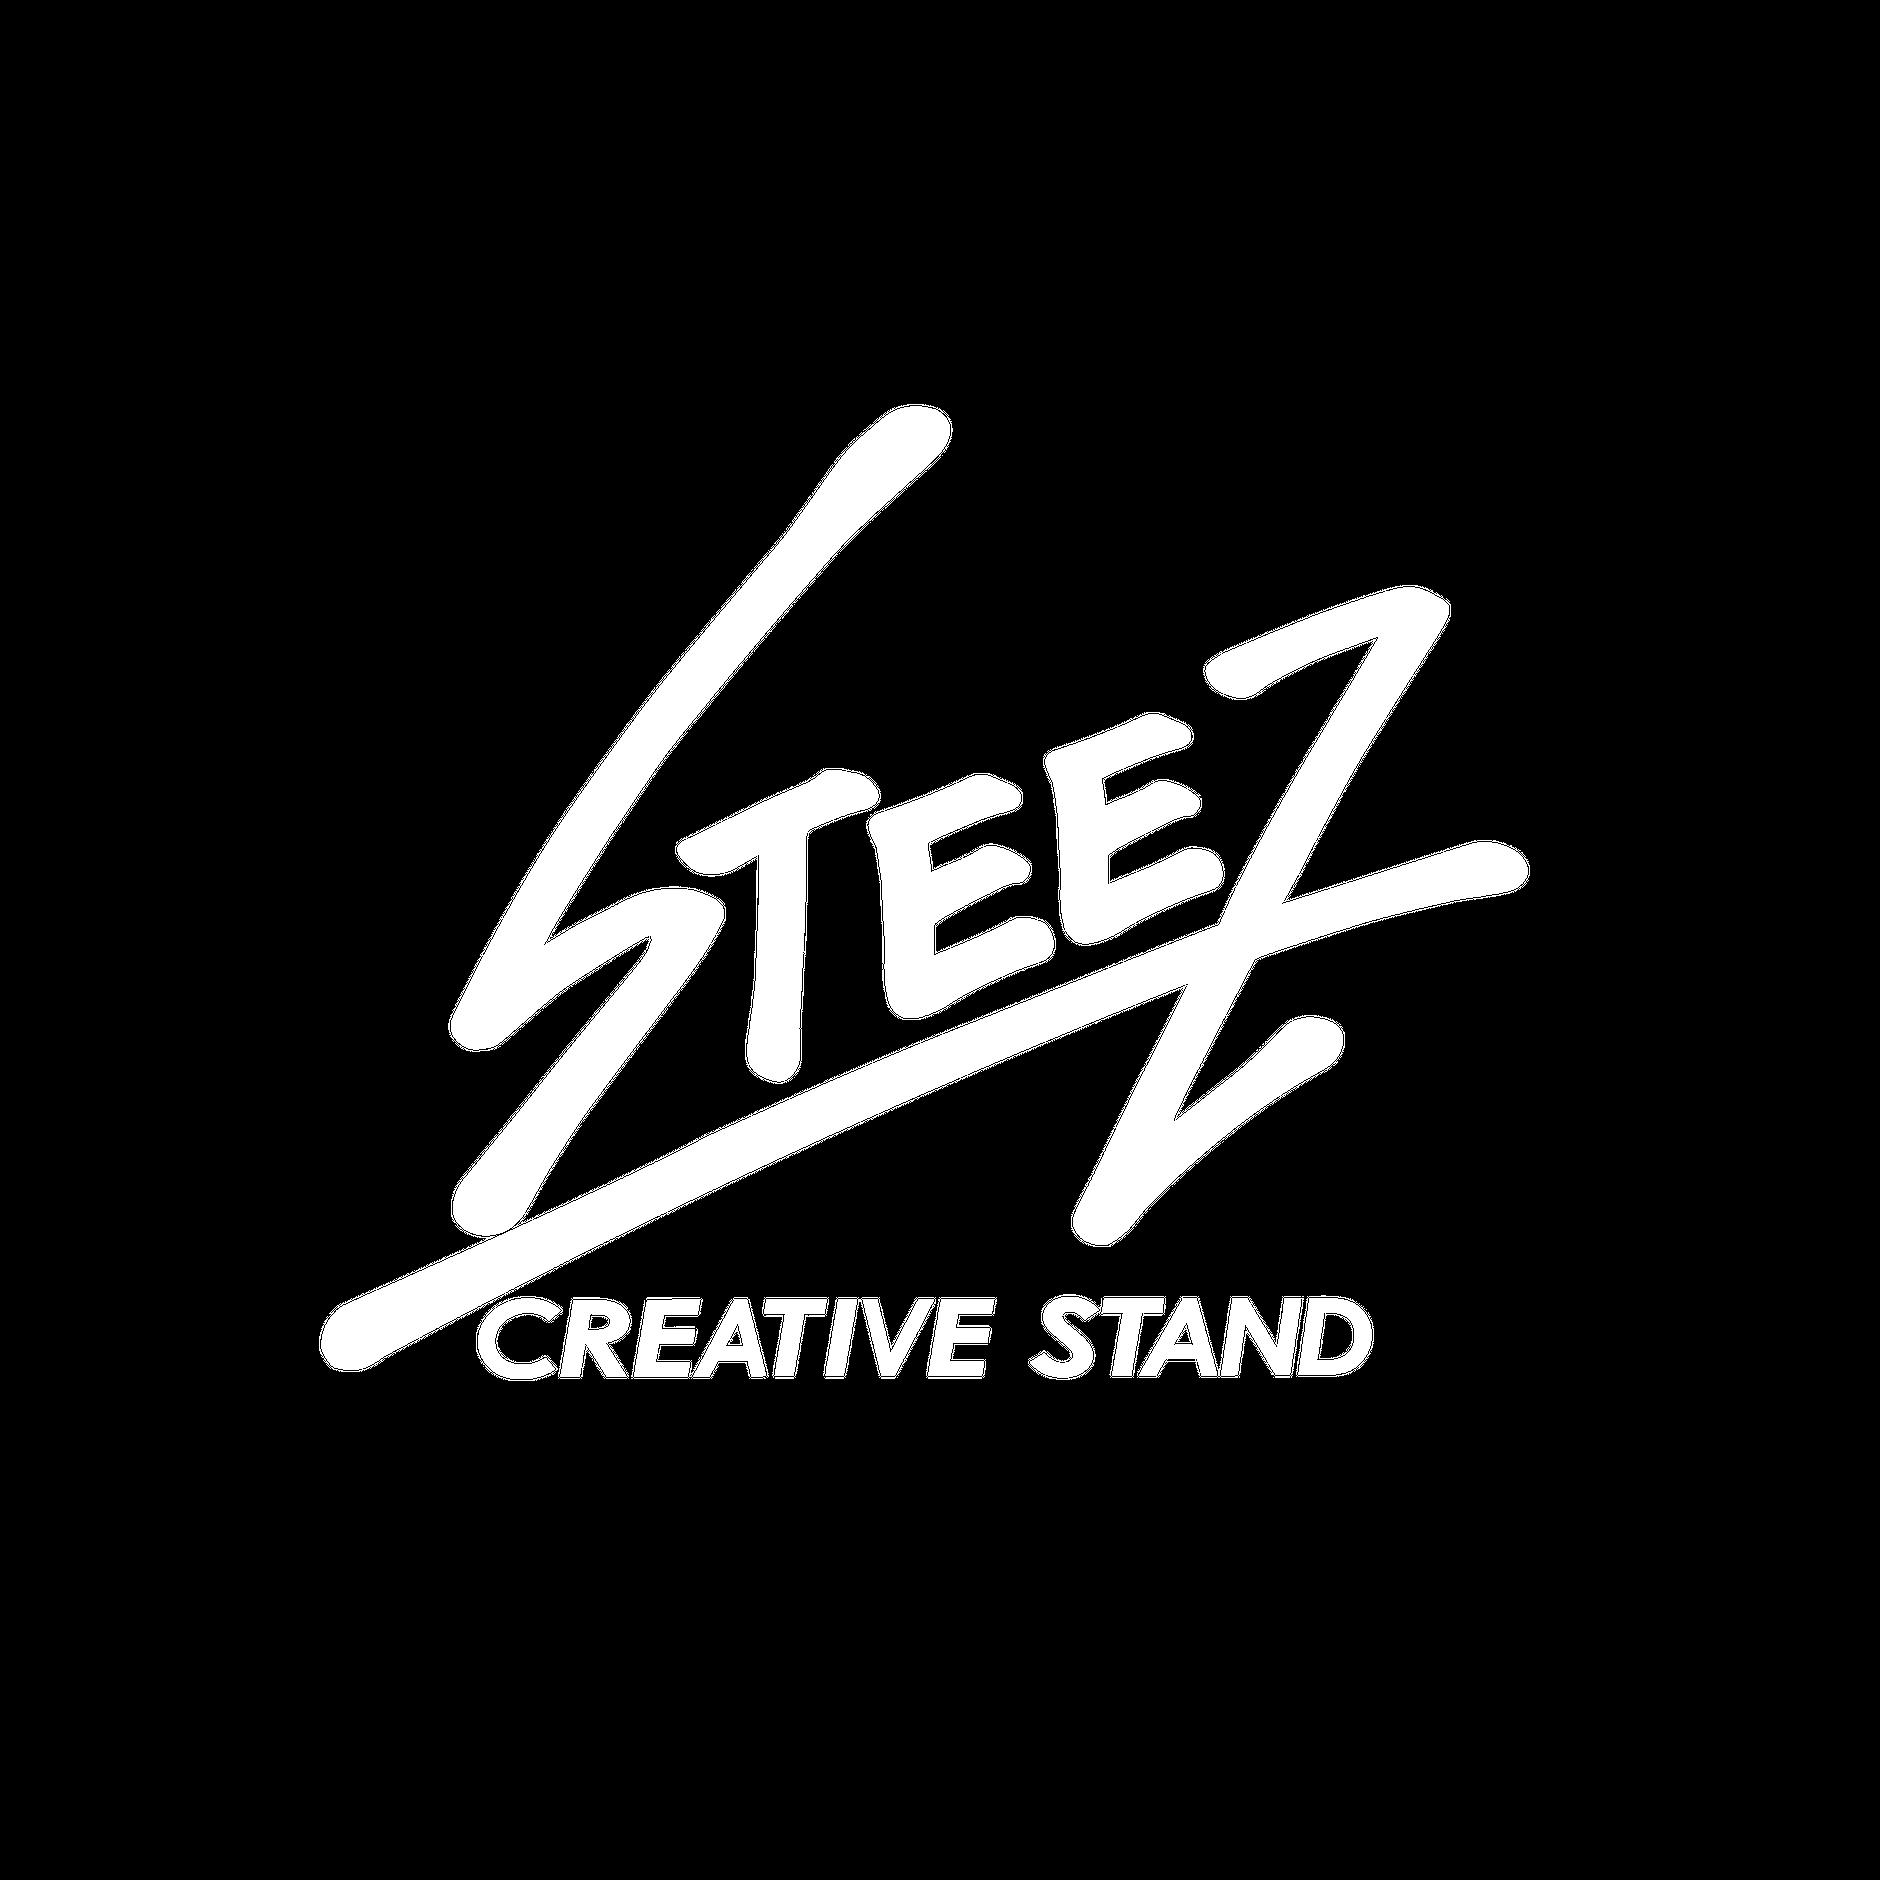 STEEZ CREATIVE STAND